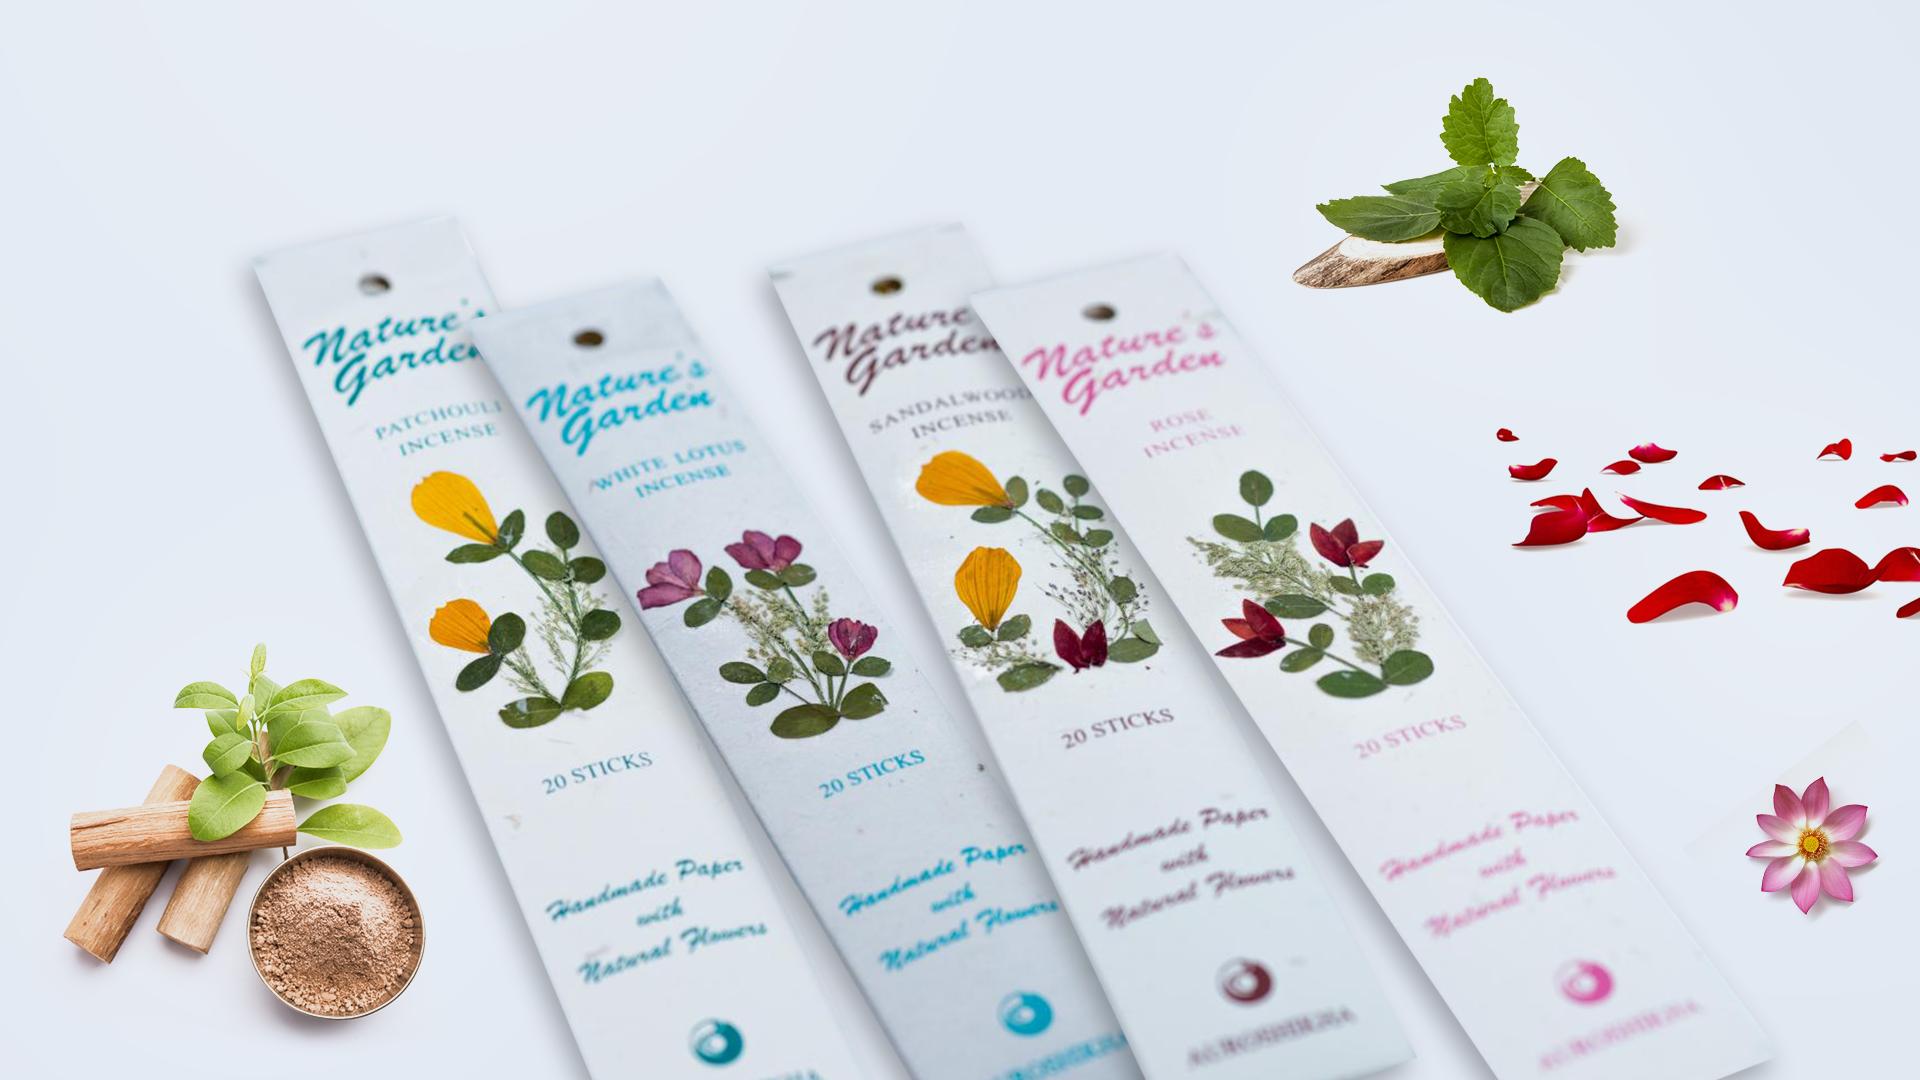 Bețișoare parfumate naturale premium, Trandafir, Patchouli, Lotus Alb, Lemn de Santal - Pachet 4 Arome